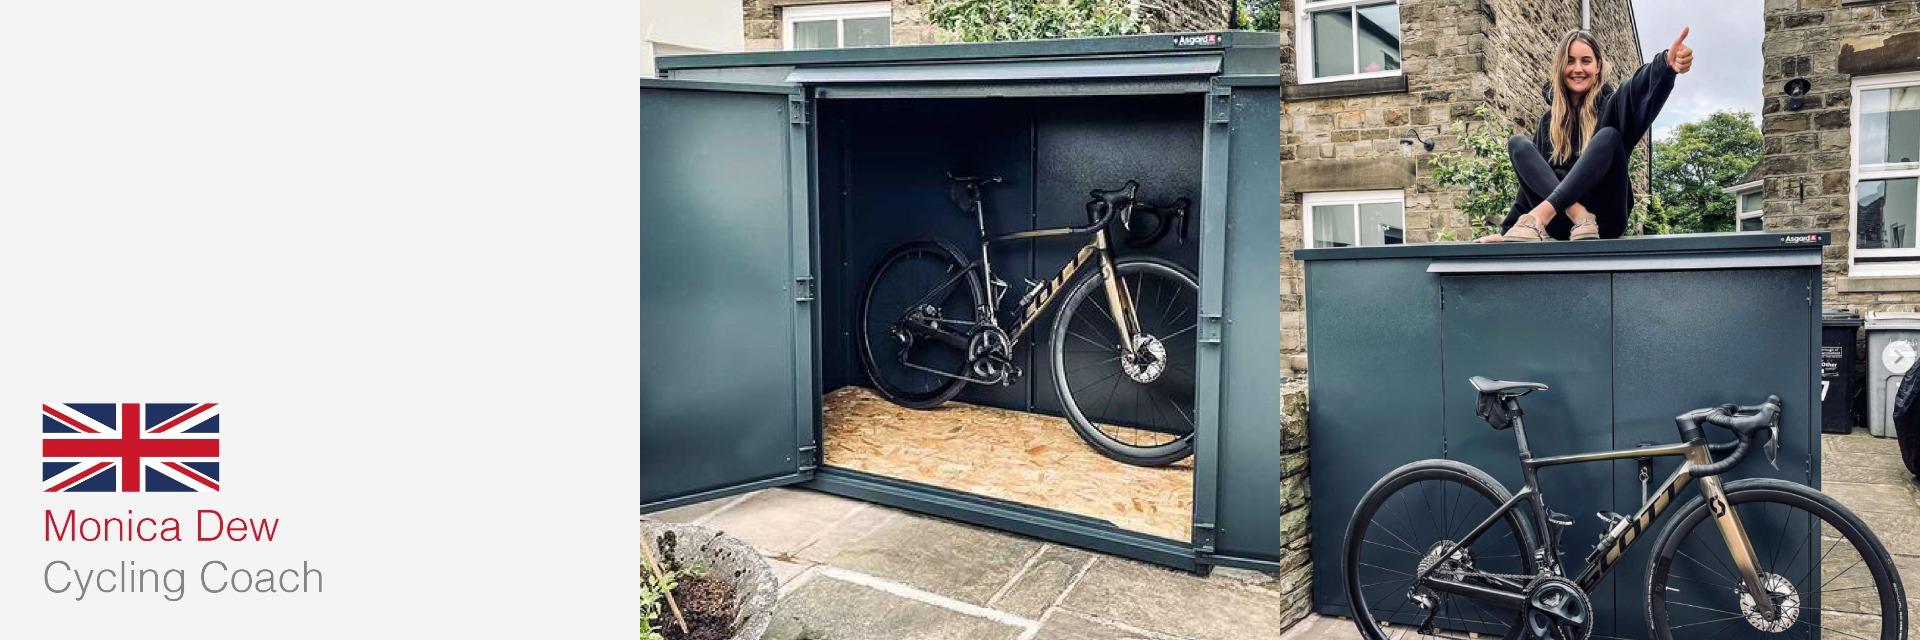 Monica Dew's Annexe Bike Storage Shed